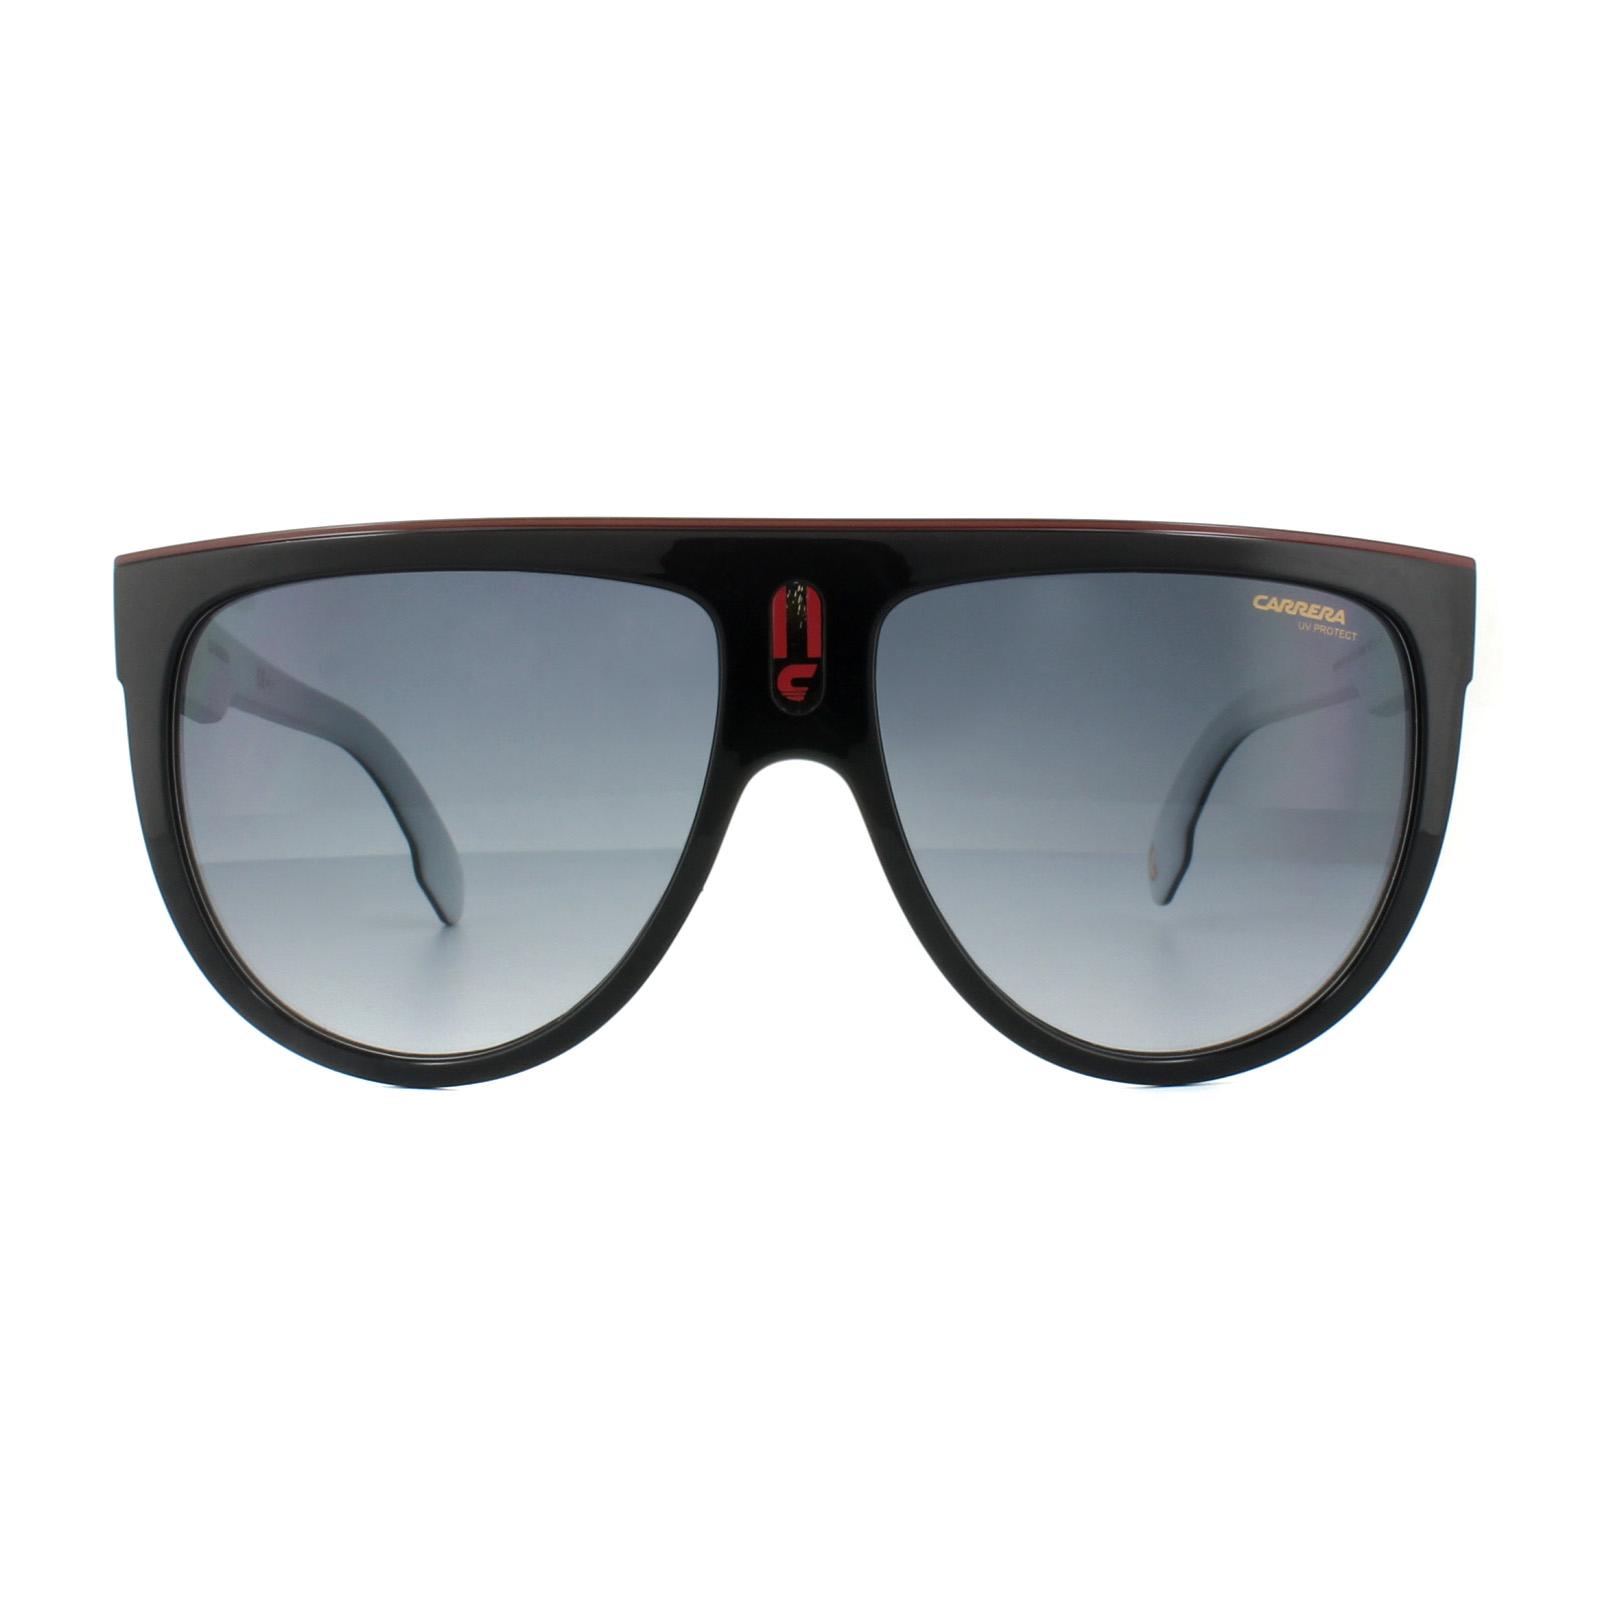 e383add4b9ee7 Carrera Flagtop Sunglasses Thumbnail 1 Carrera Flagtop Sunglasses Thumbnail  2 ...